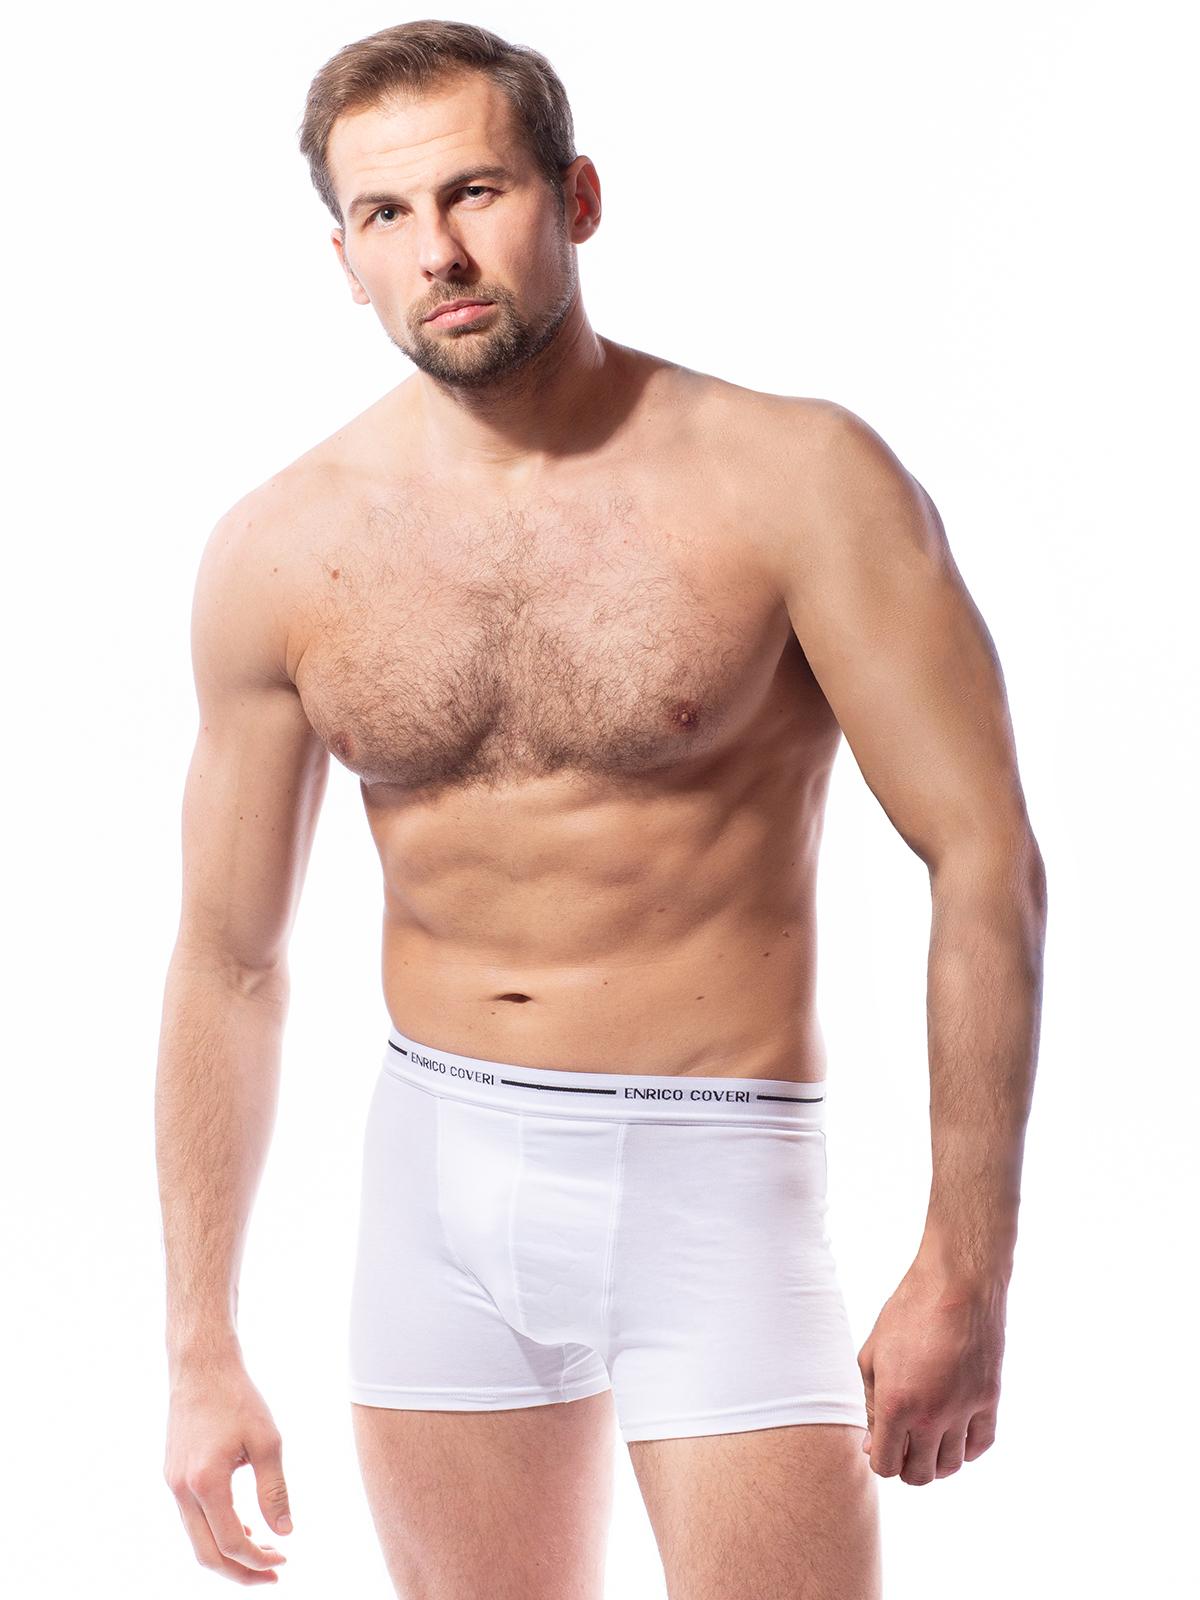 Трусы боксеры мужские Enrico Coveri белые XL